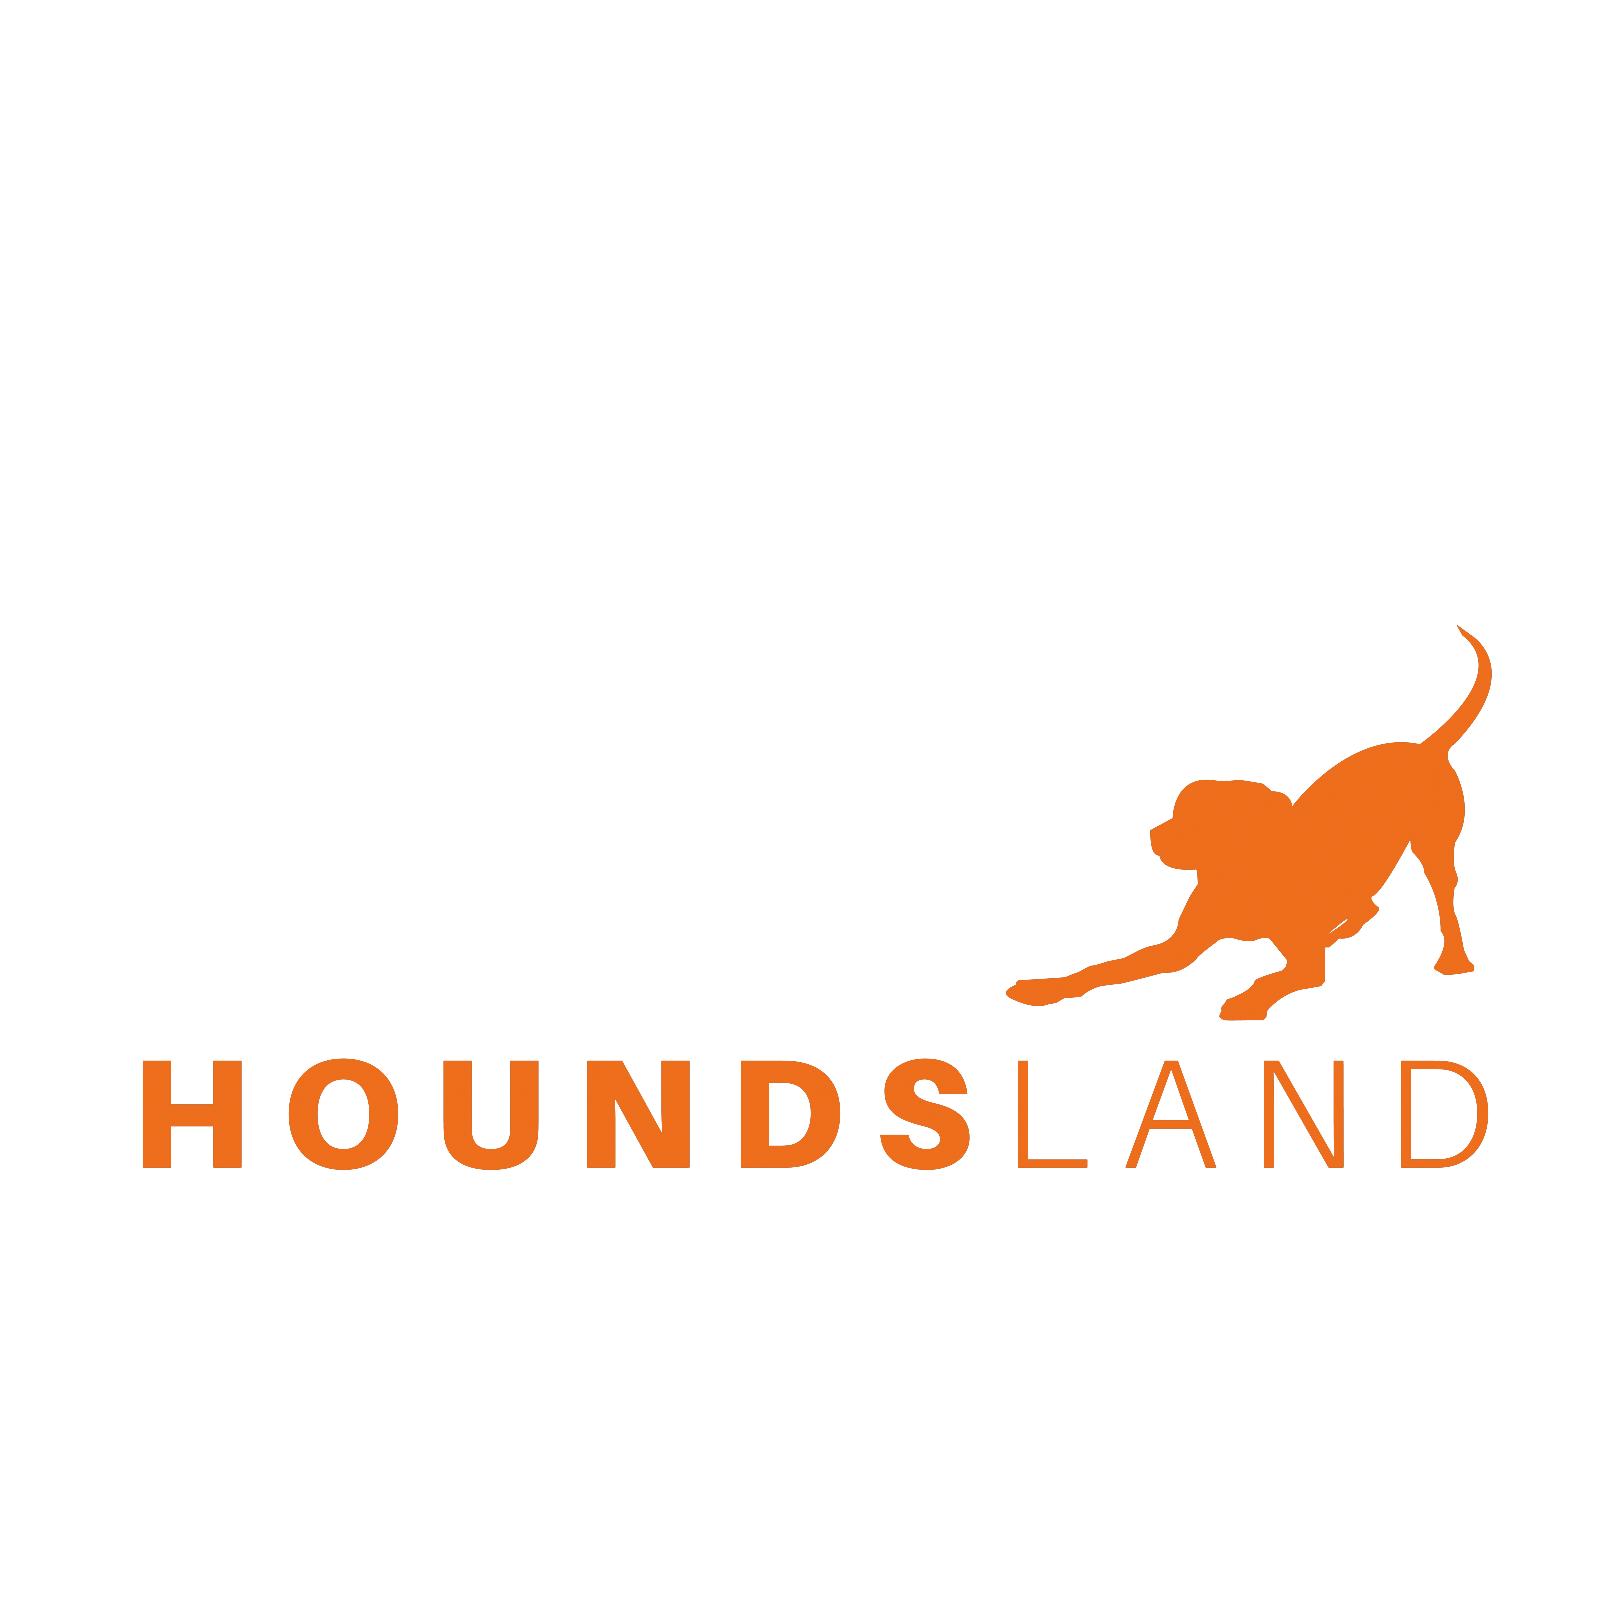 HoundsLand Ltd